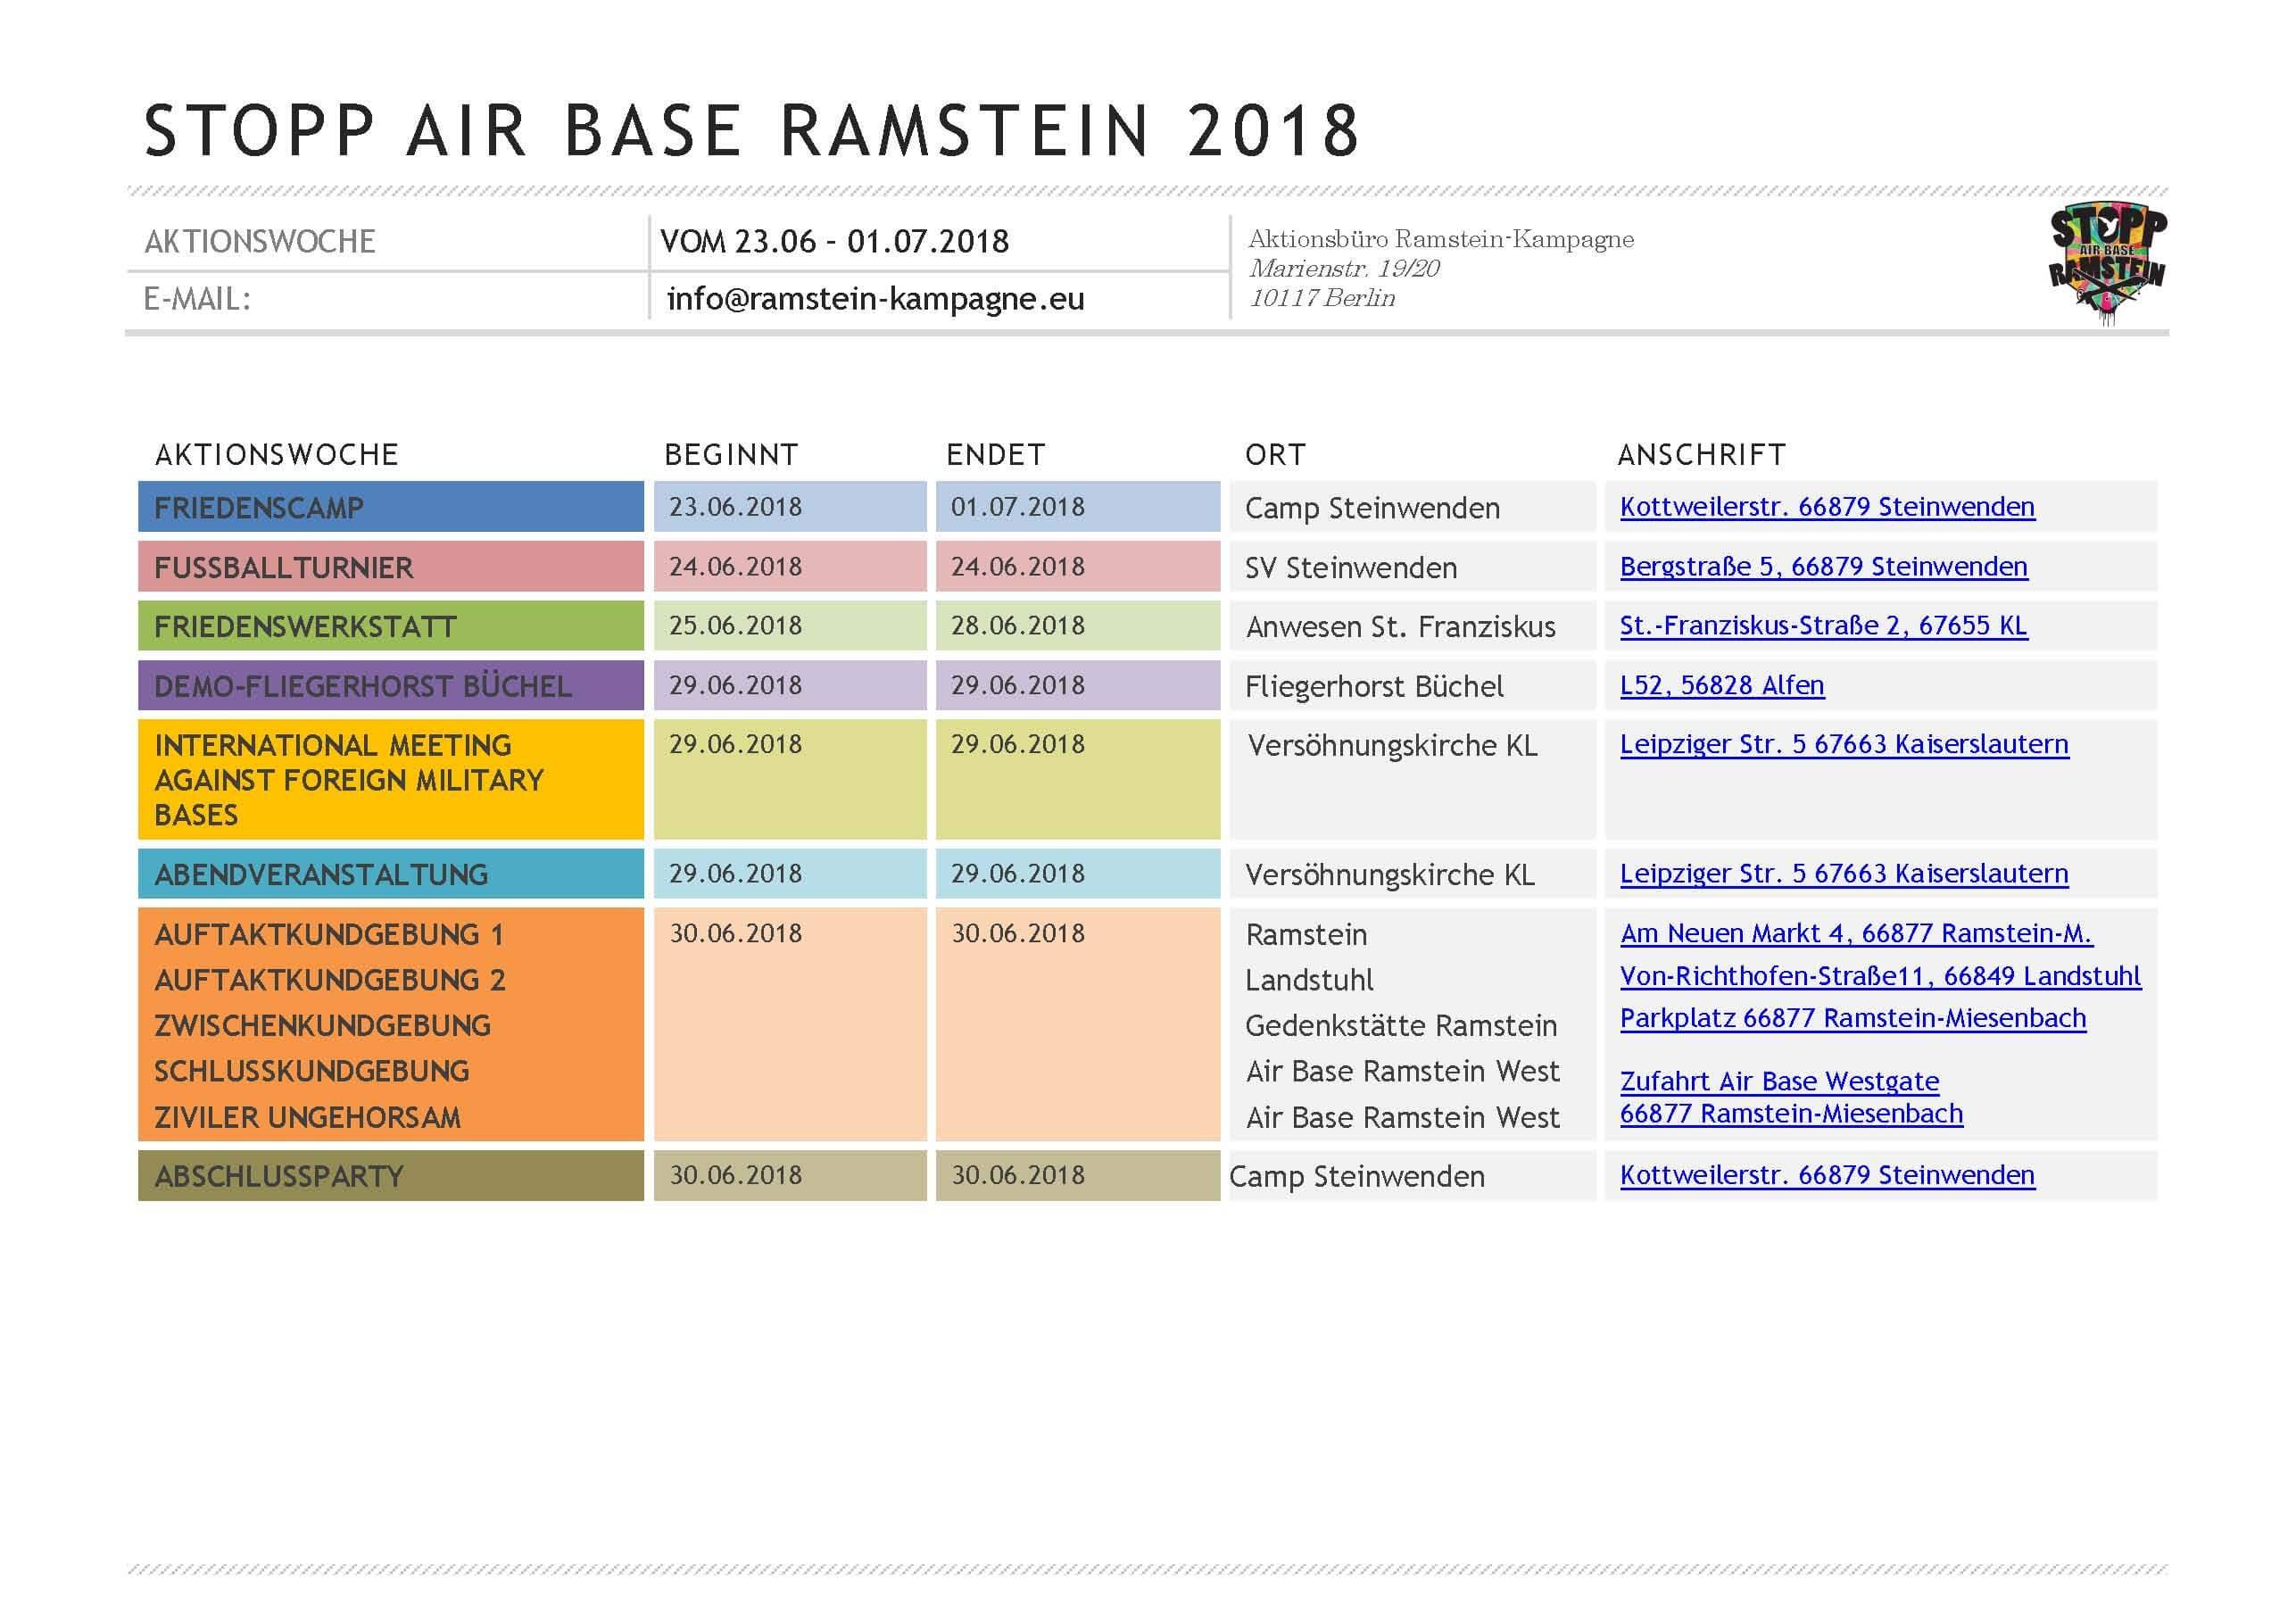 Timeline-Stopp-Air-Base-Ramstein-2018_Seite_1.jpg